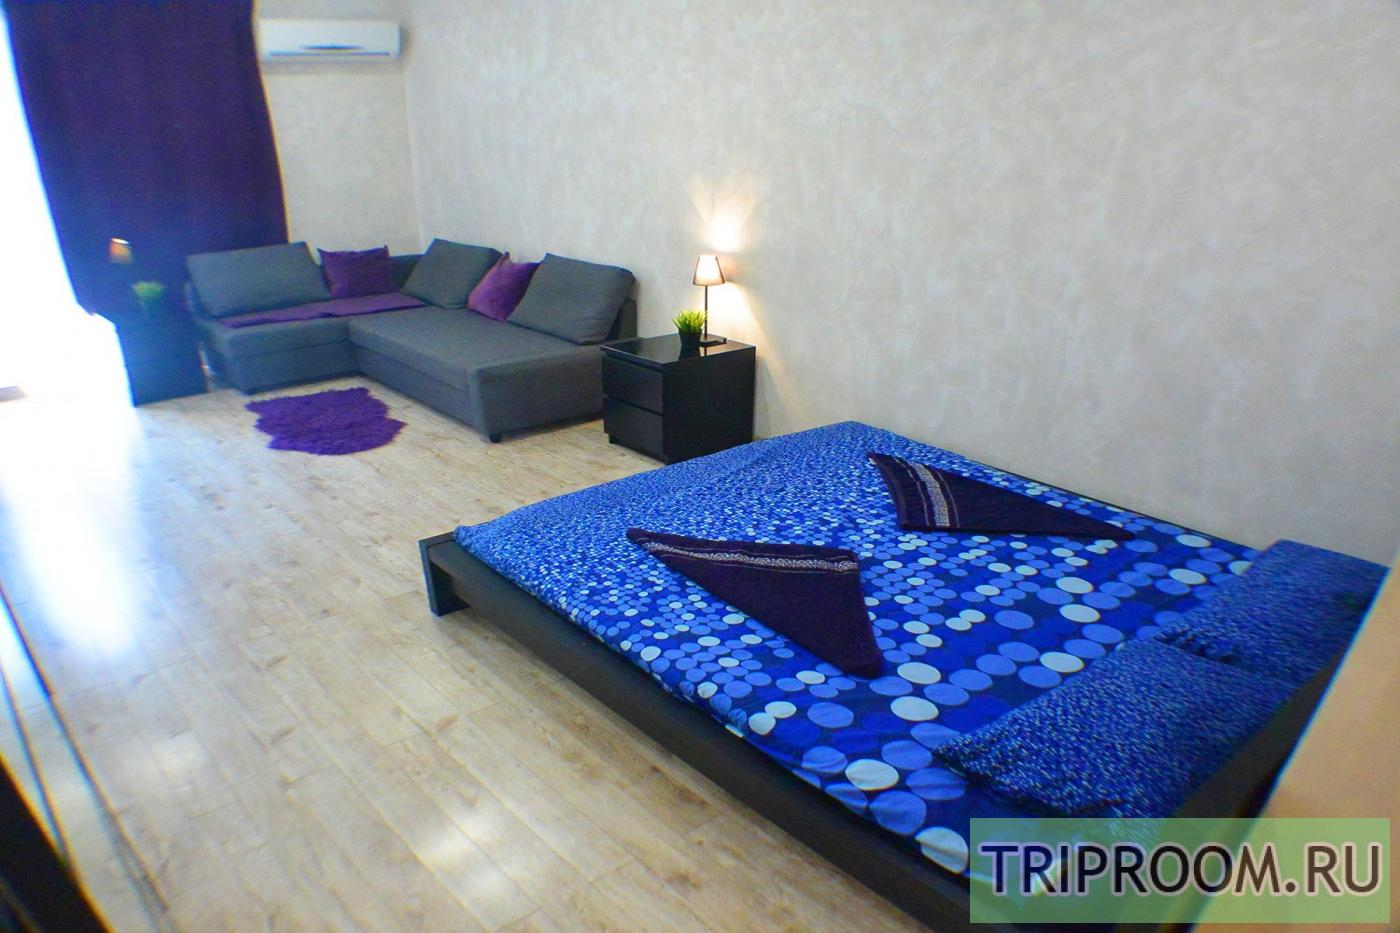 1-комнатная квартира посуточно (вариант № 26990), ул. Кирпичная улица, фото № 5